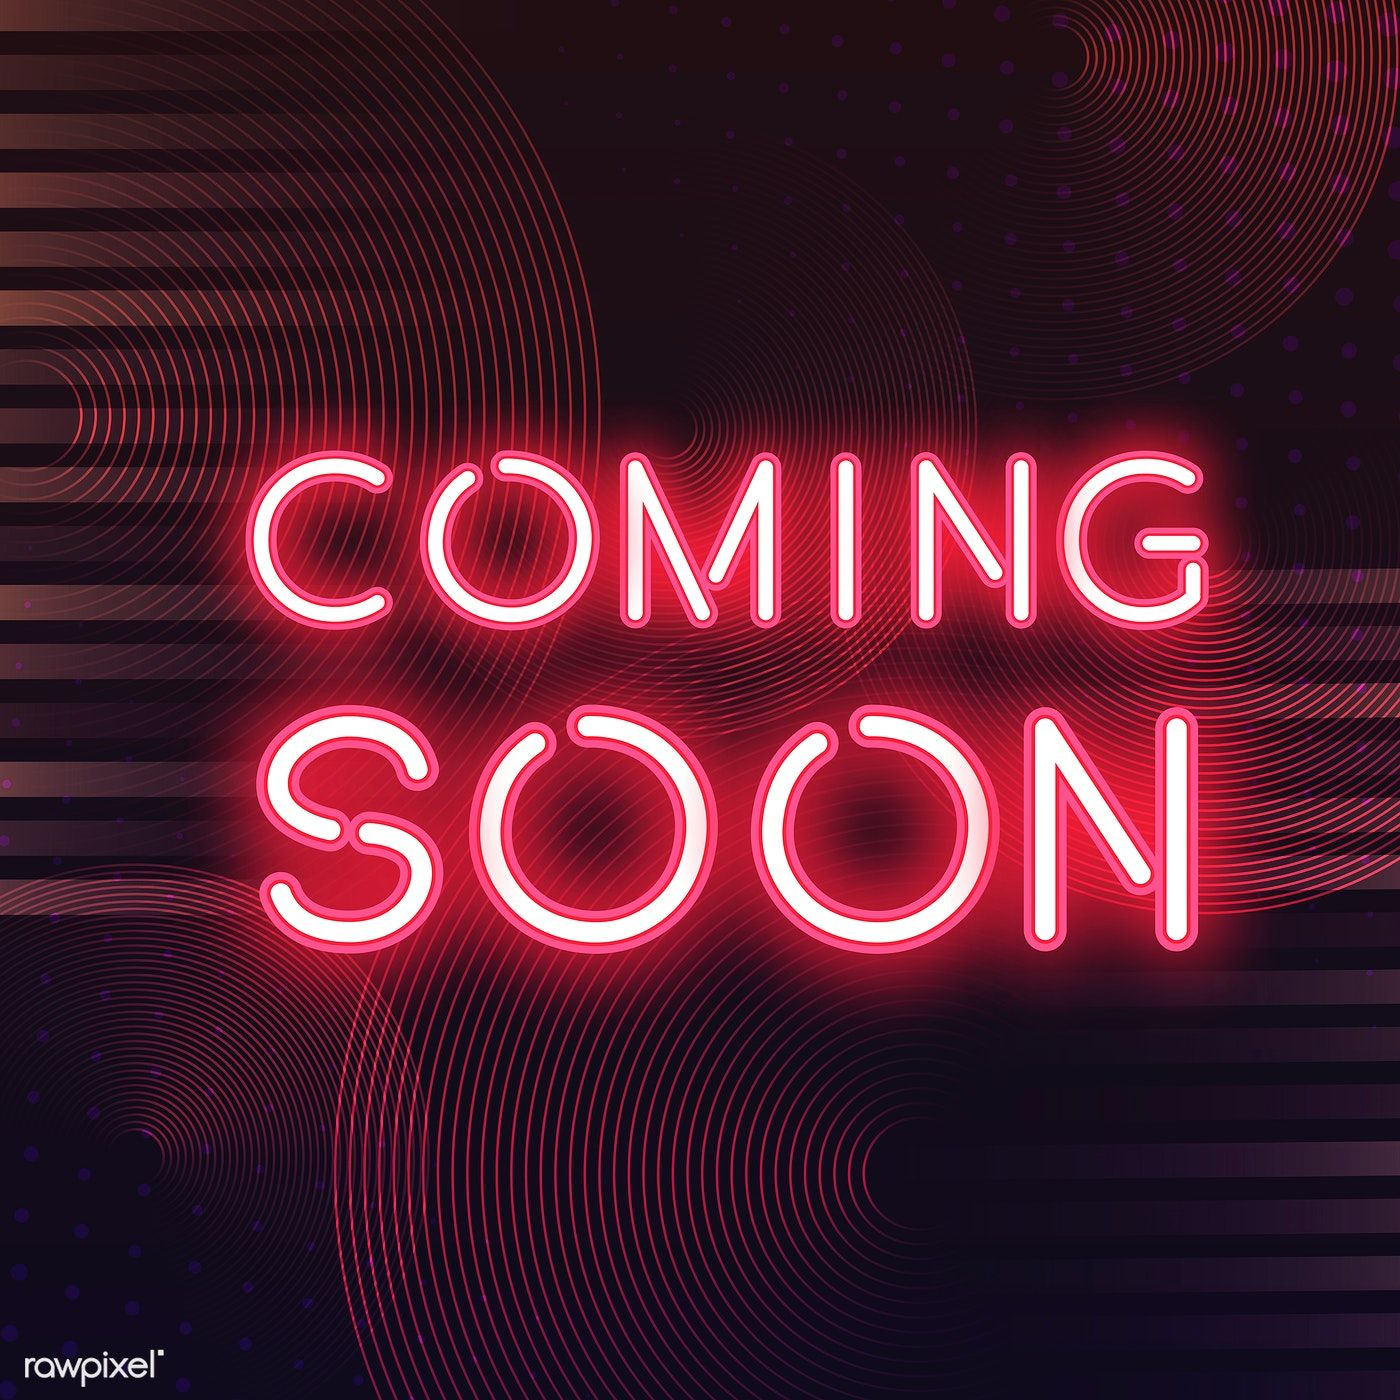 Autel Nano Coming soon